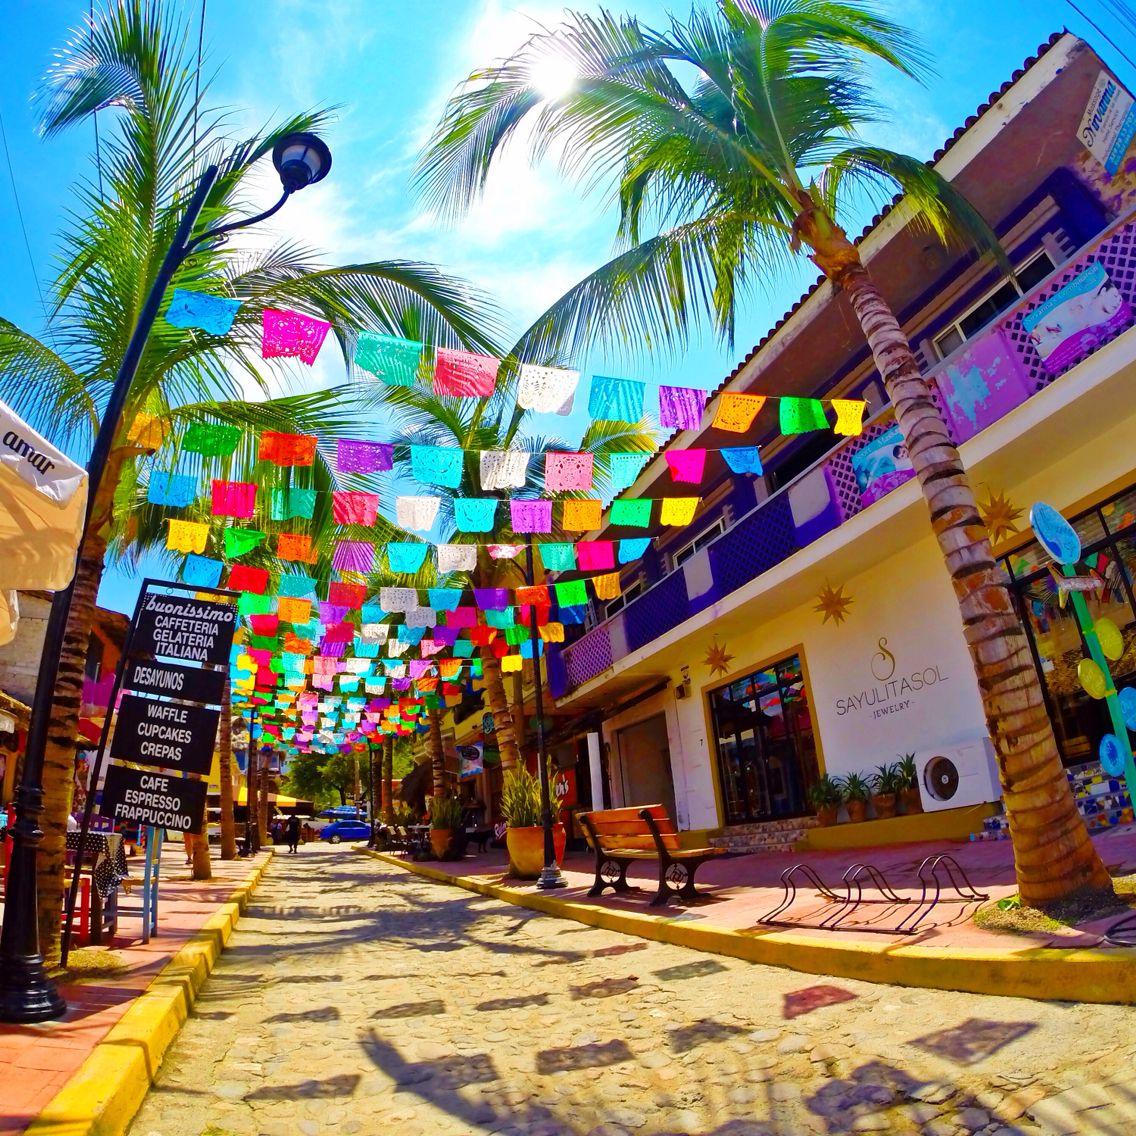 Sayulita Nayarit mexico colored papelitos